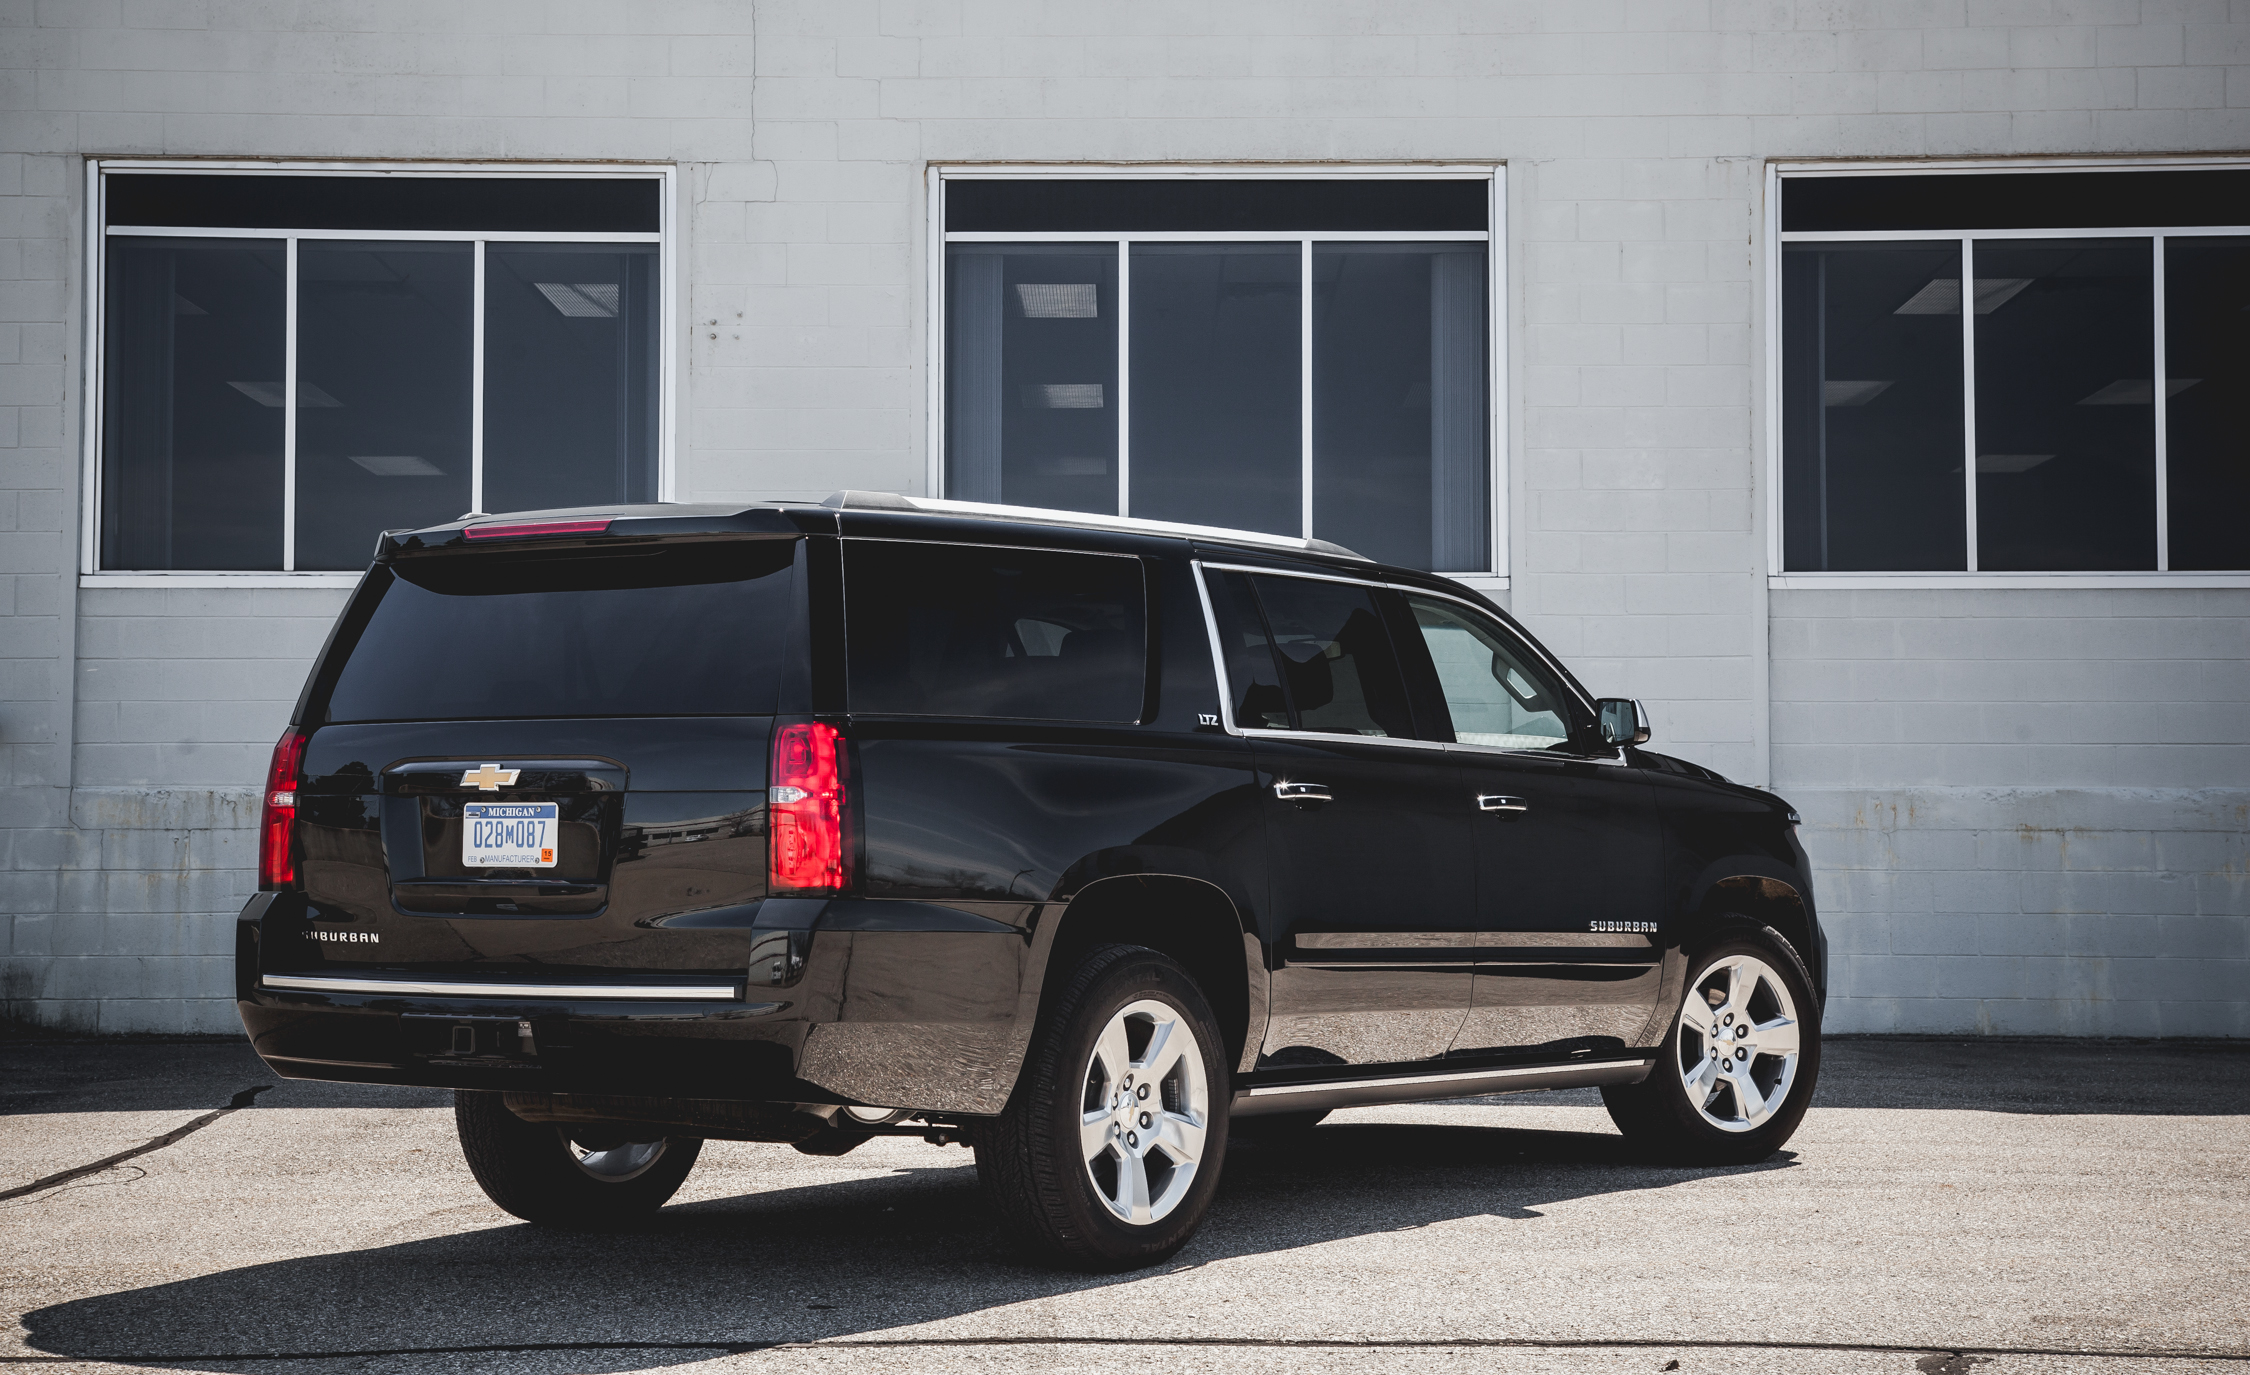 2015 Chevrolet Suburban LTZ Exterior Body Rear and Side